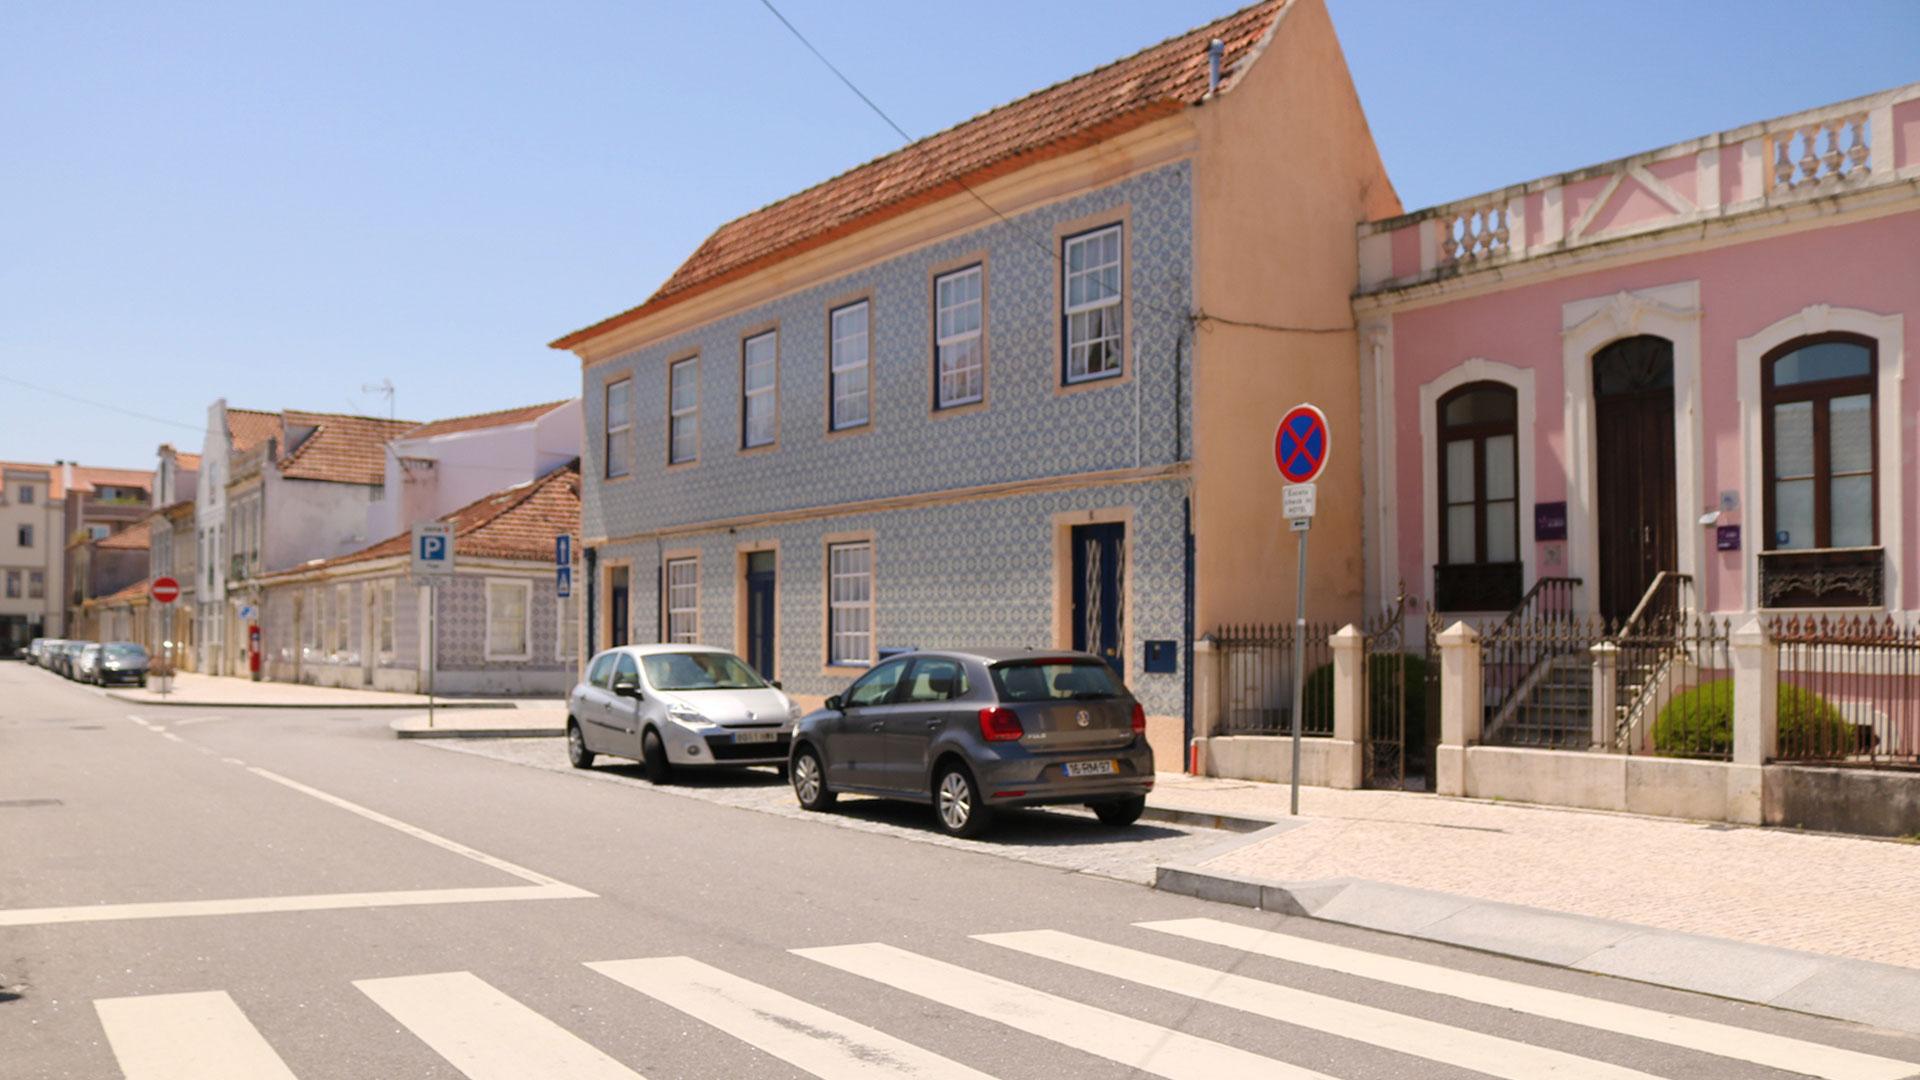 Alboi-Aveiro-ville-real-estate-imobiliaria-comprar-arrendar-vender-moradia-apartamento-casa-t0-t1-t2-t3-t4-5